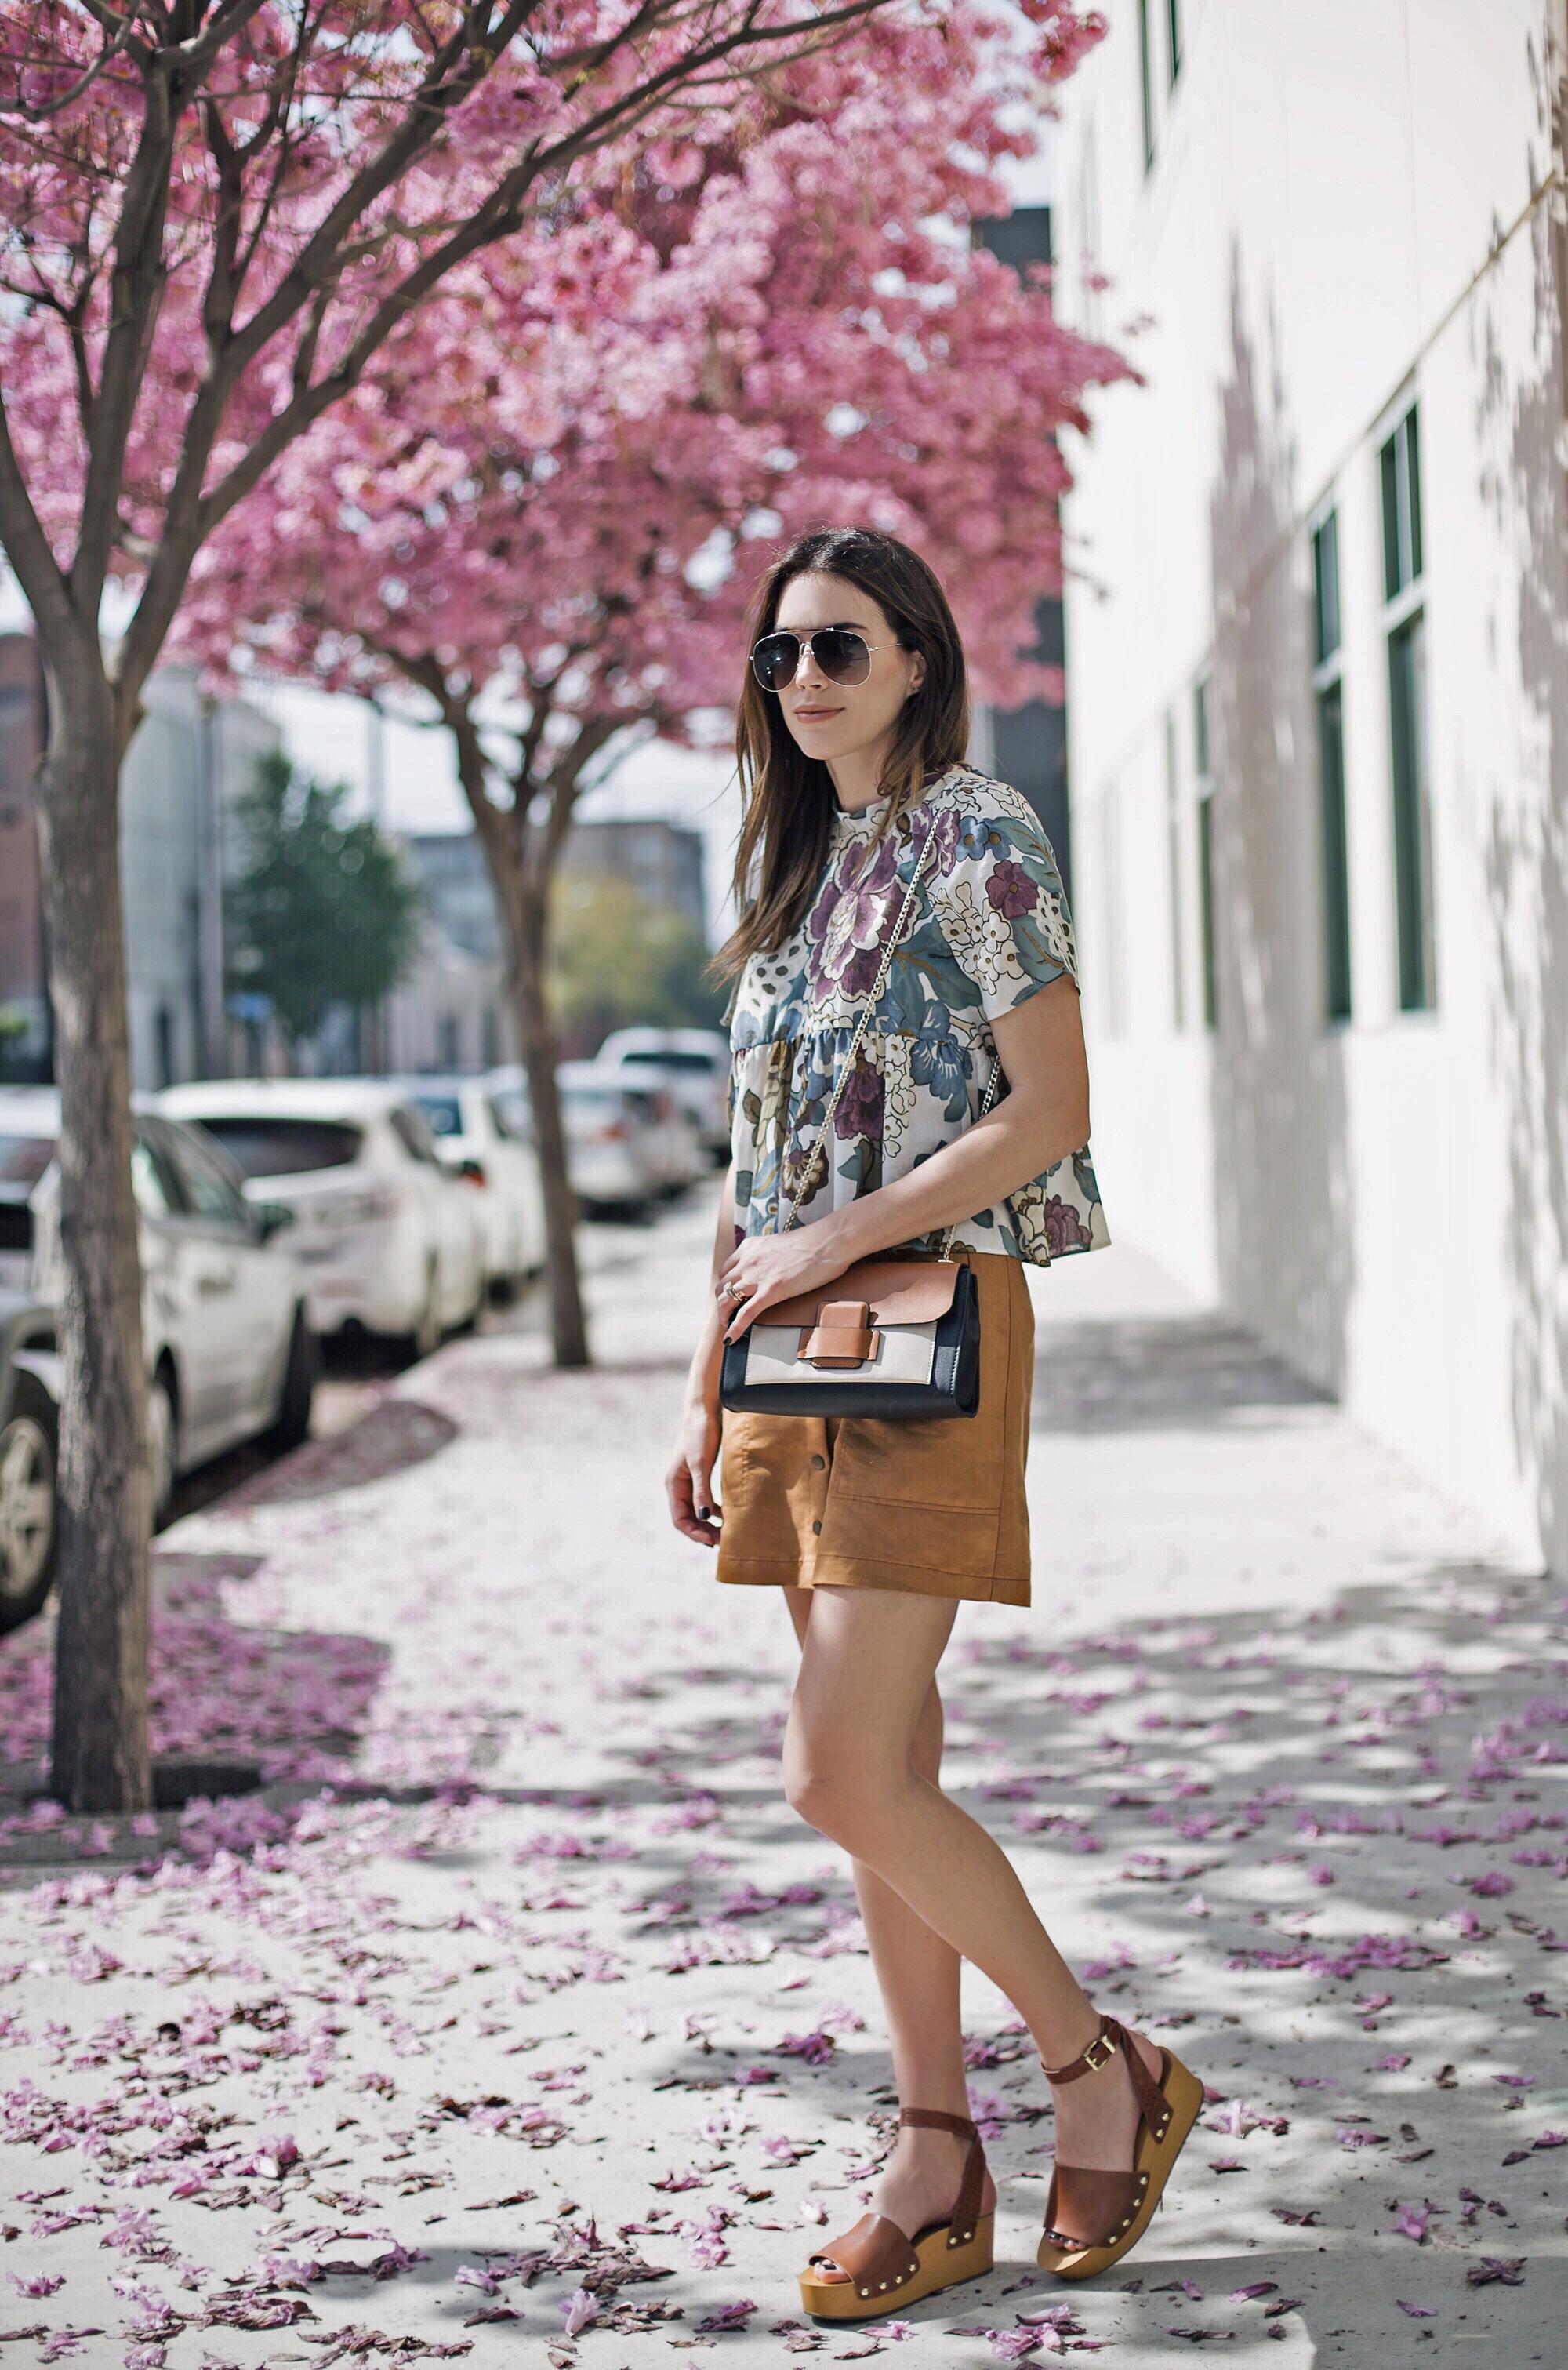 Wooden Flatform Sandal Tan Skirt